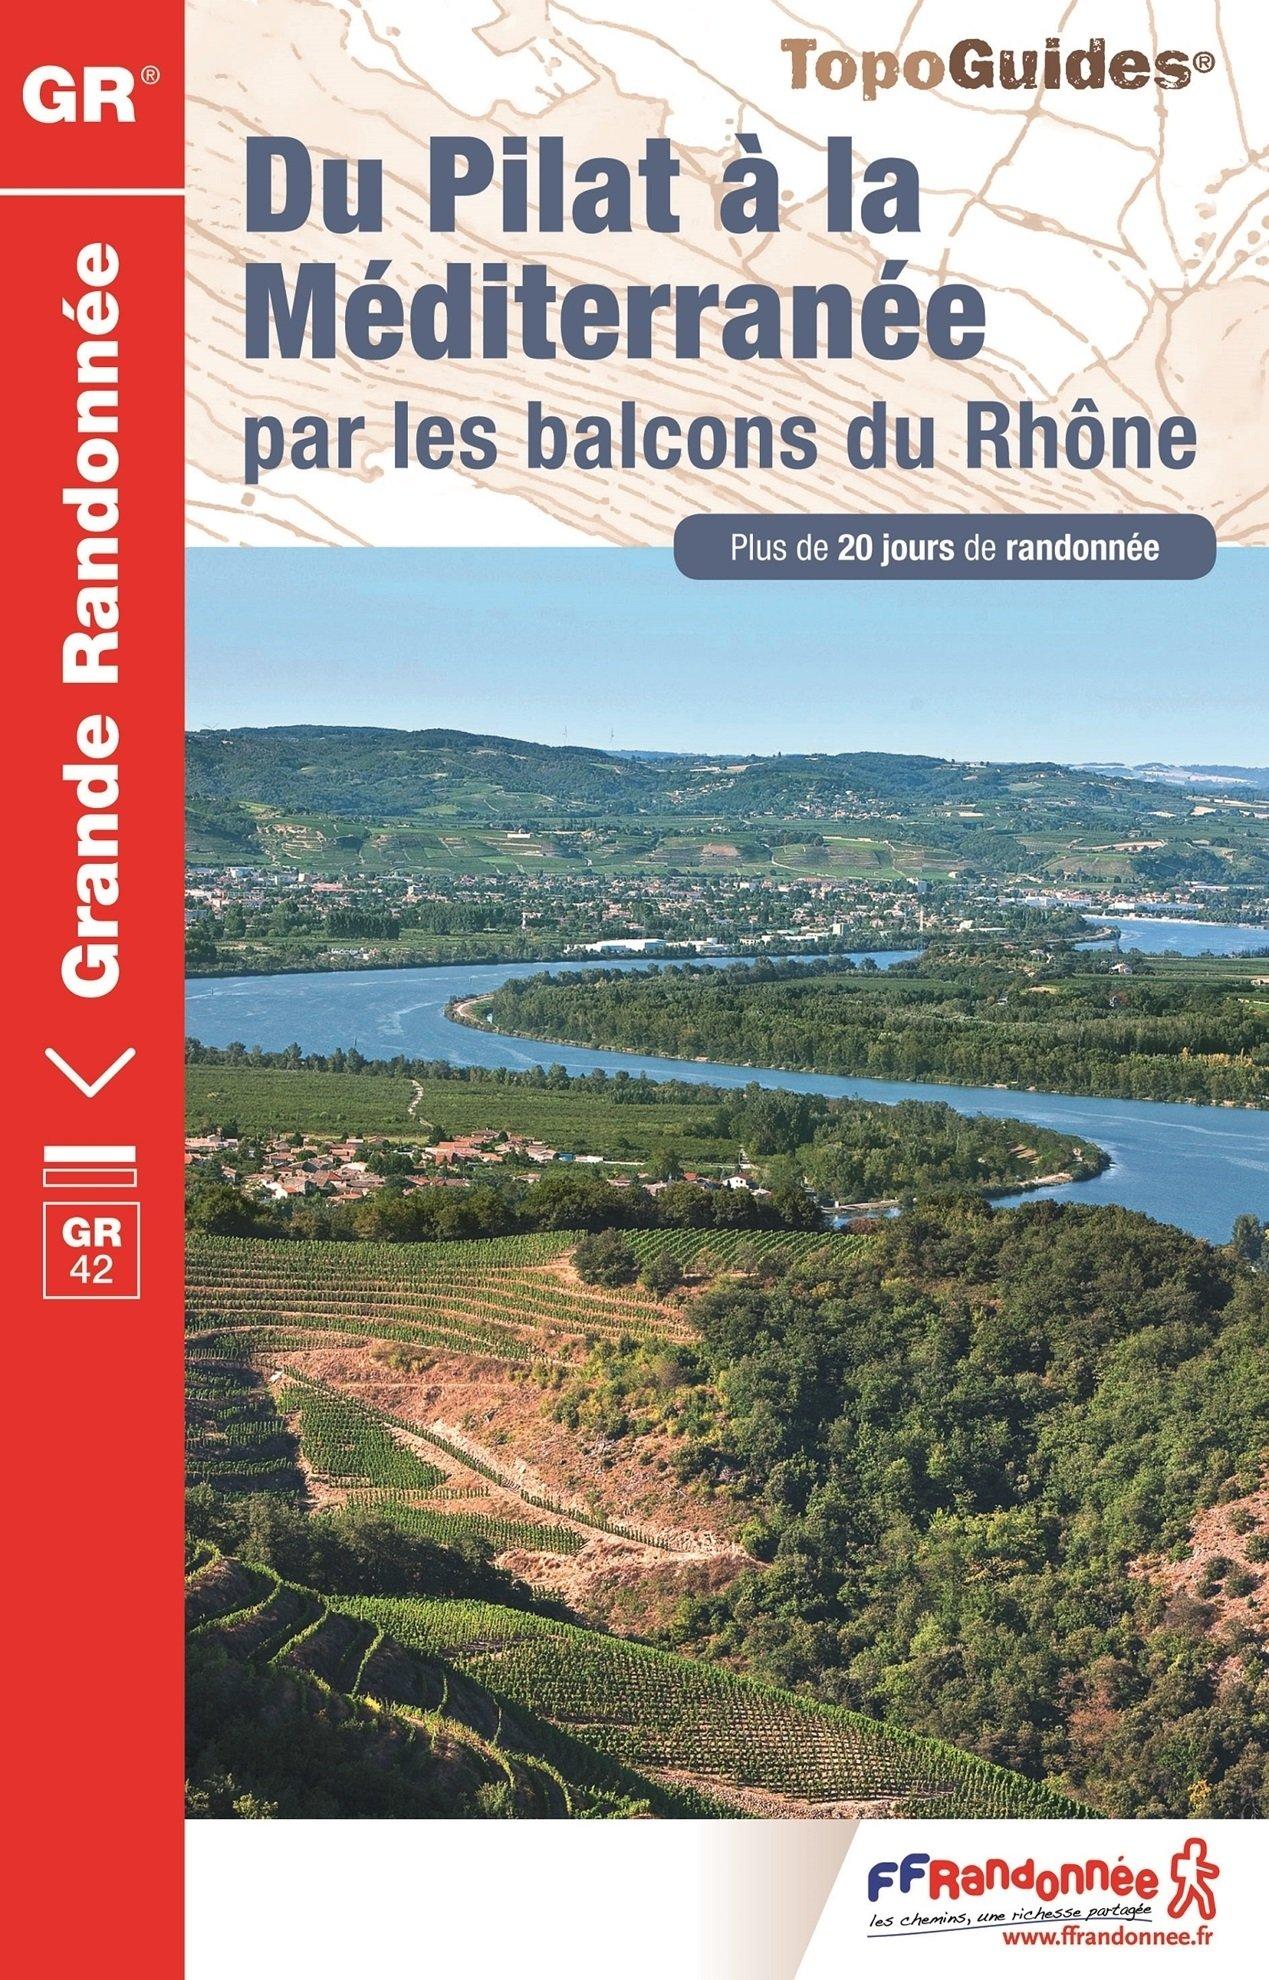 TG411 Balcons du Rhône (GR42) 9782751408588  FFRP Topoguides  Meerdaagse wandelroutes, Wandelgidsen Rhône, Alpen, Corsica